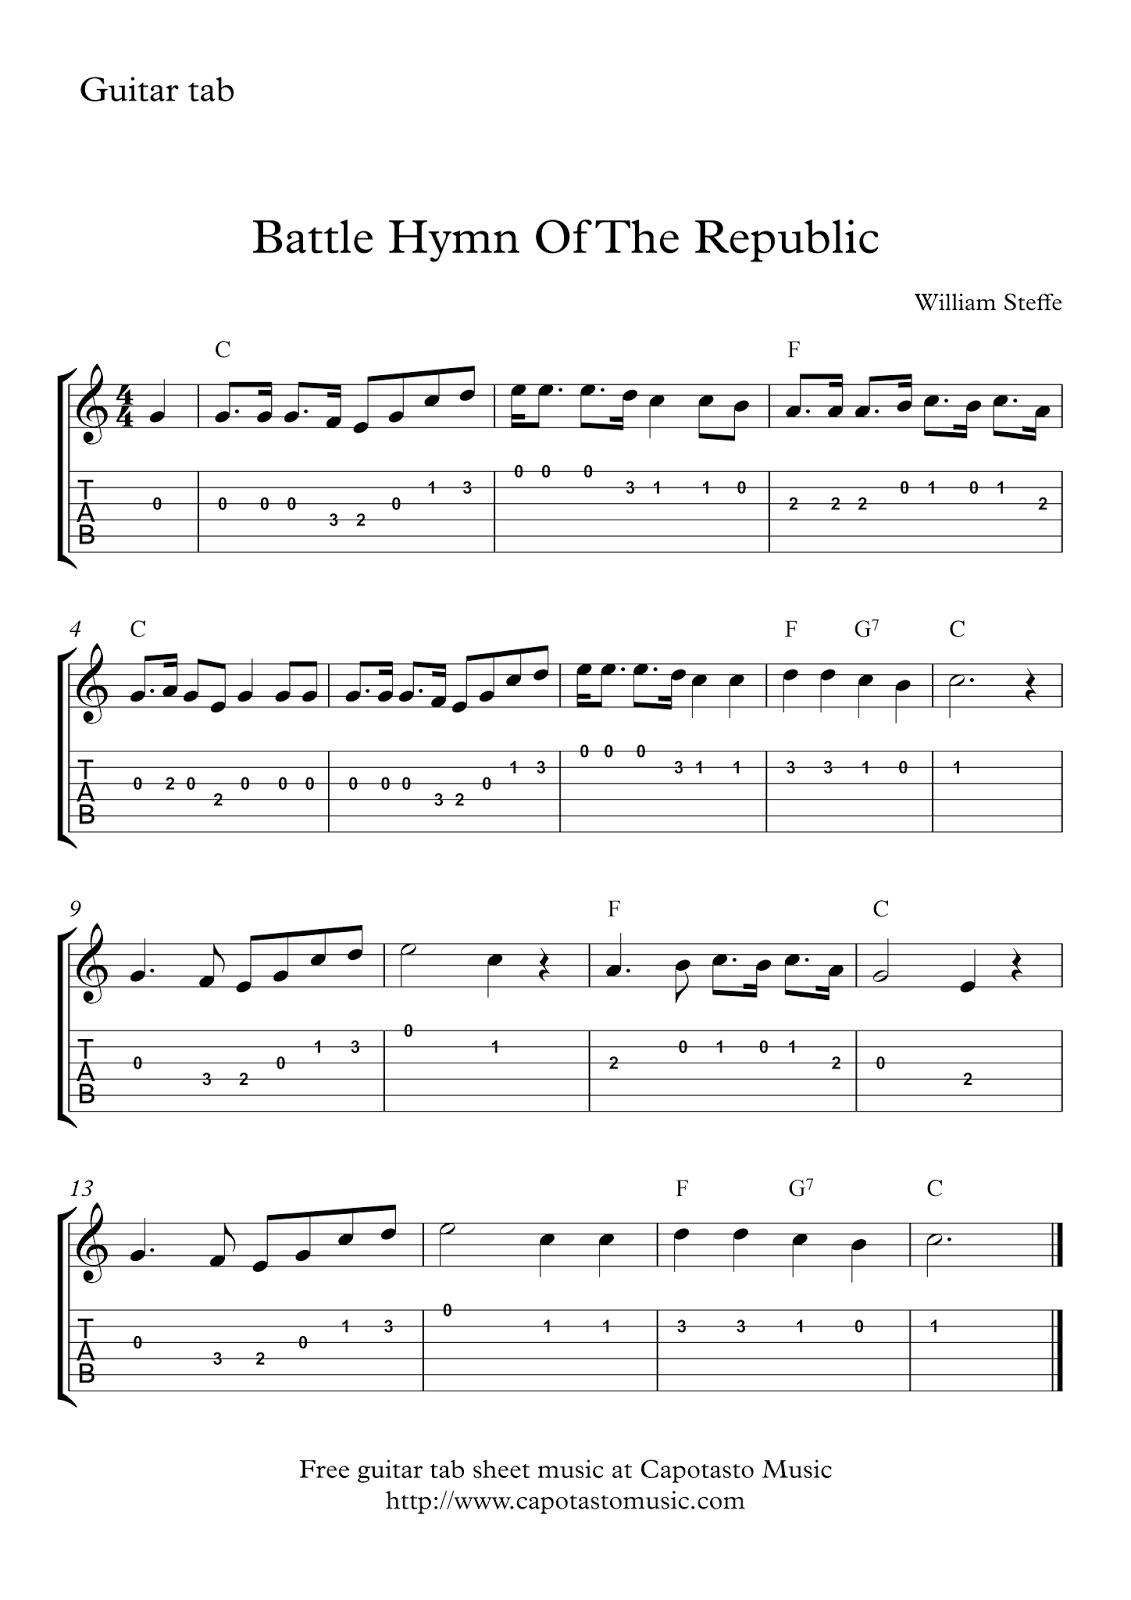 Battle Hymn Of The Republic Free Guitar Tab Sheet Music   Sheet - Free Guitar Sheet Music For Popular Songs Printable